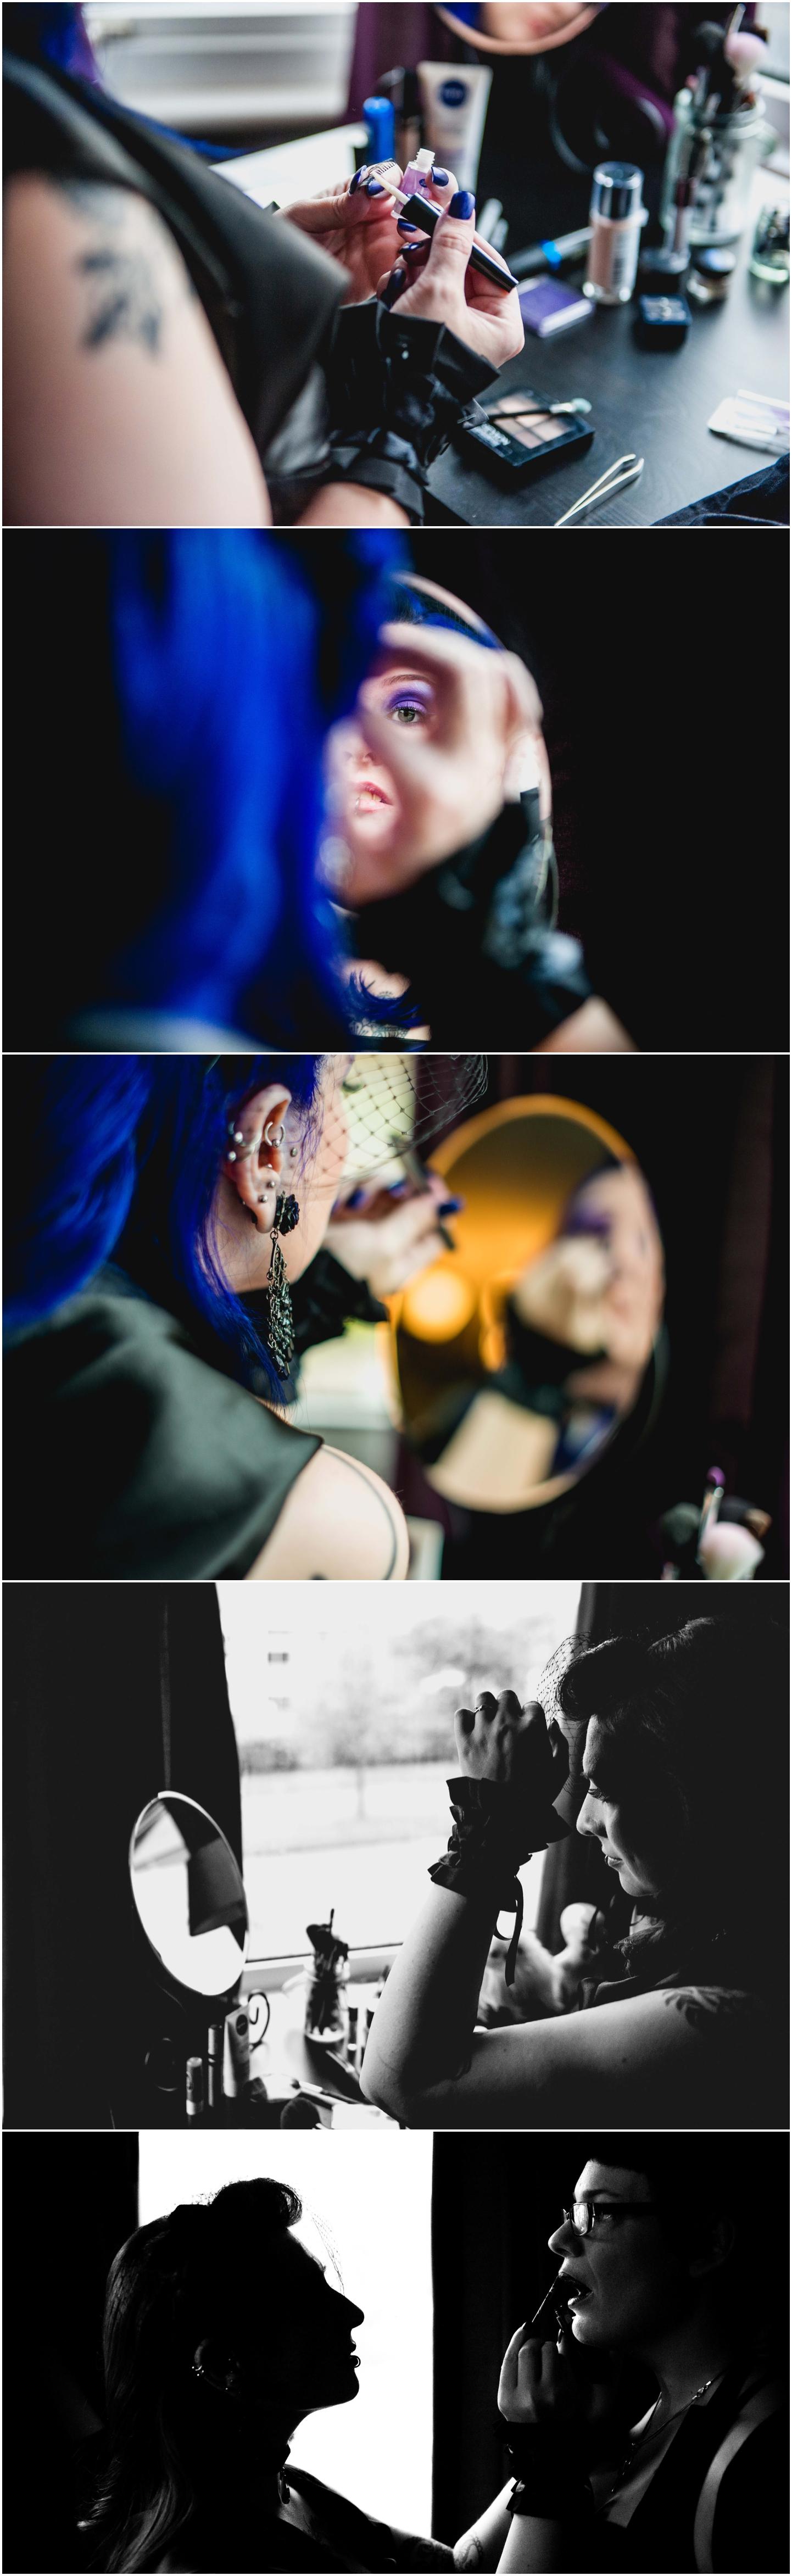 Bond Company Wedding, Digbeth, Lisa Carpenter Photography, Birmingham, photos